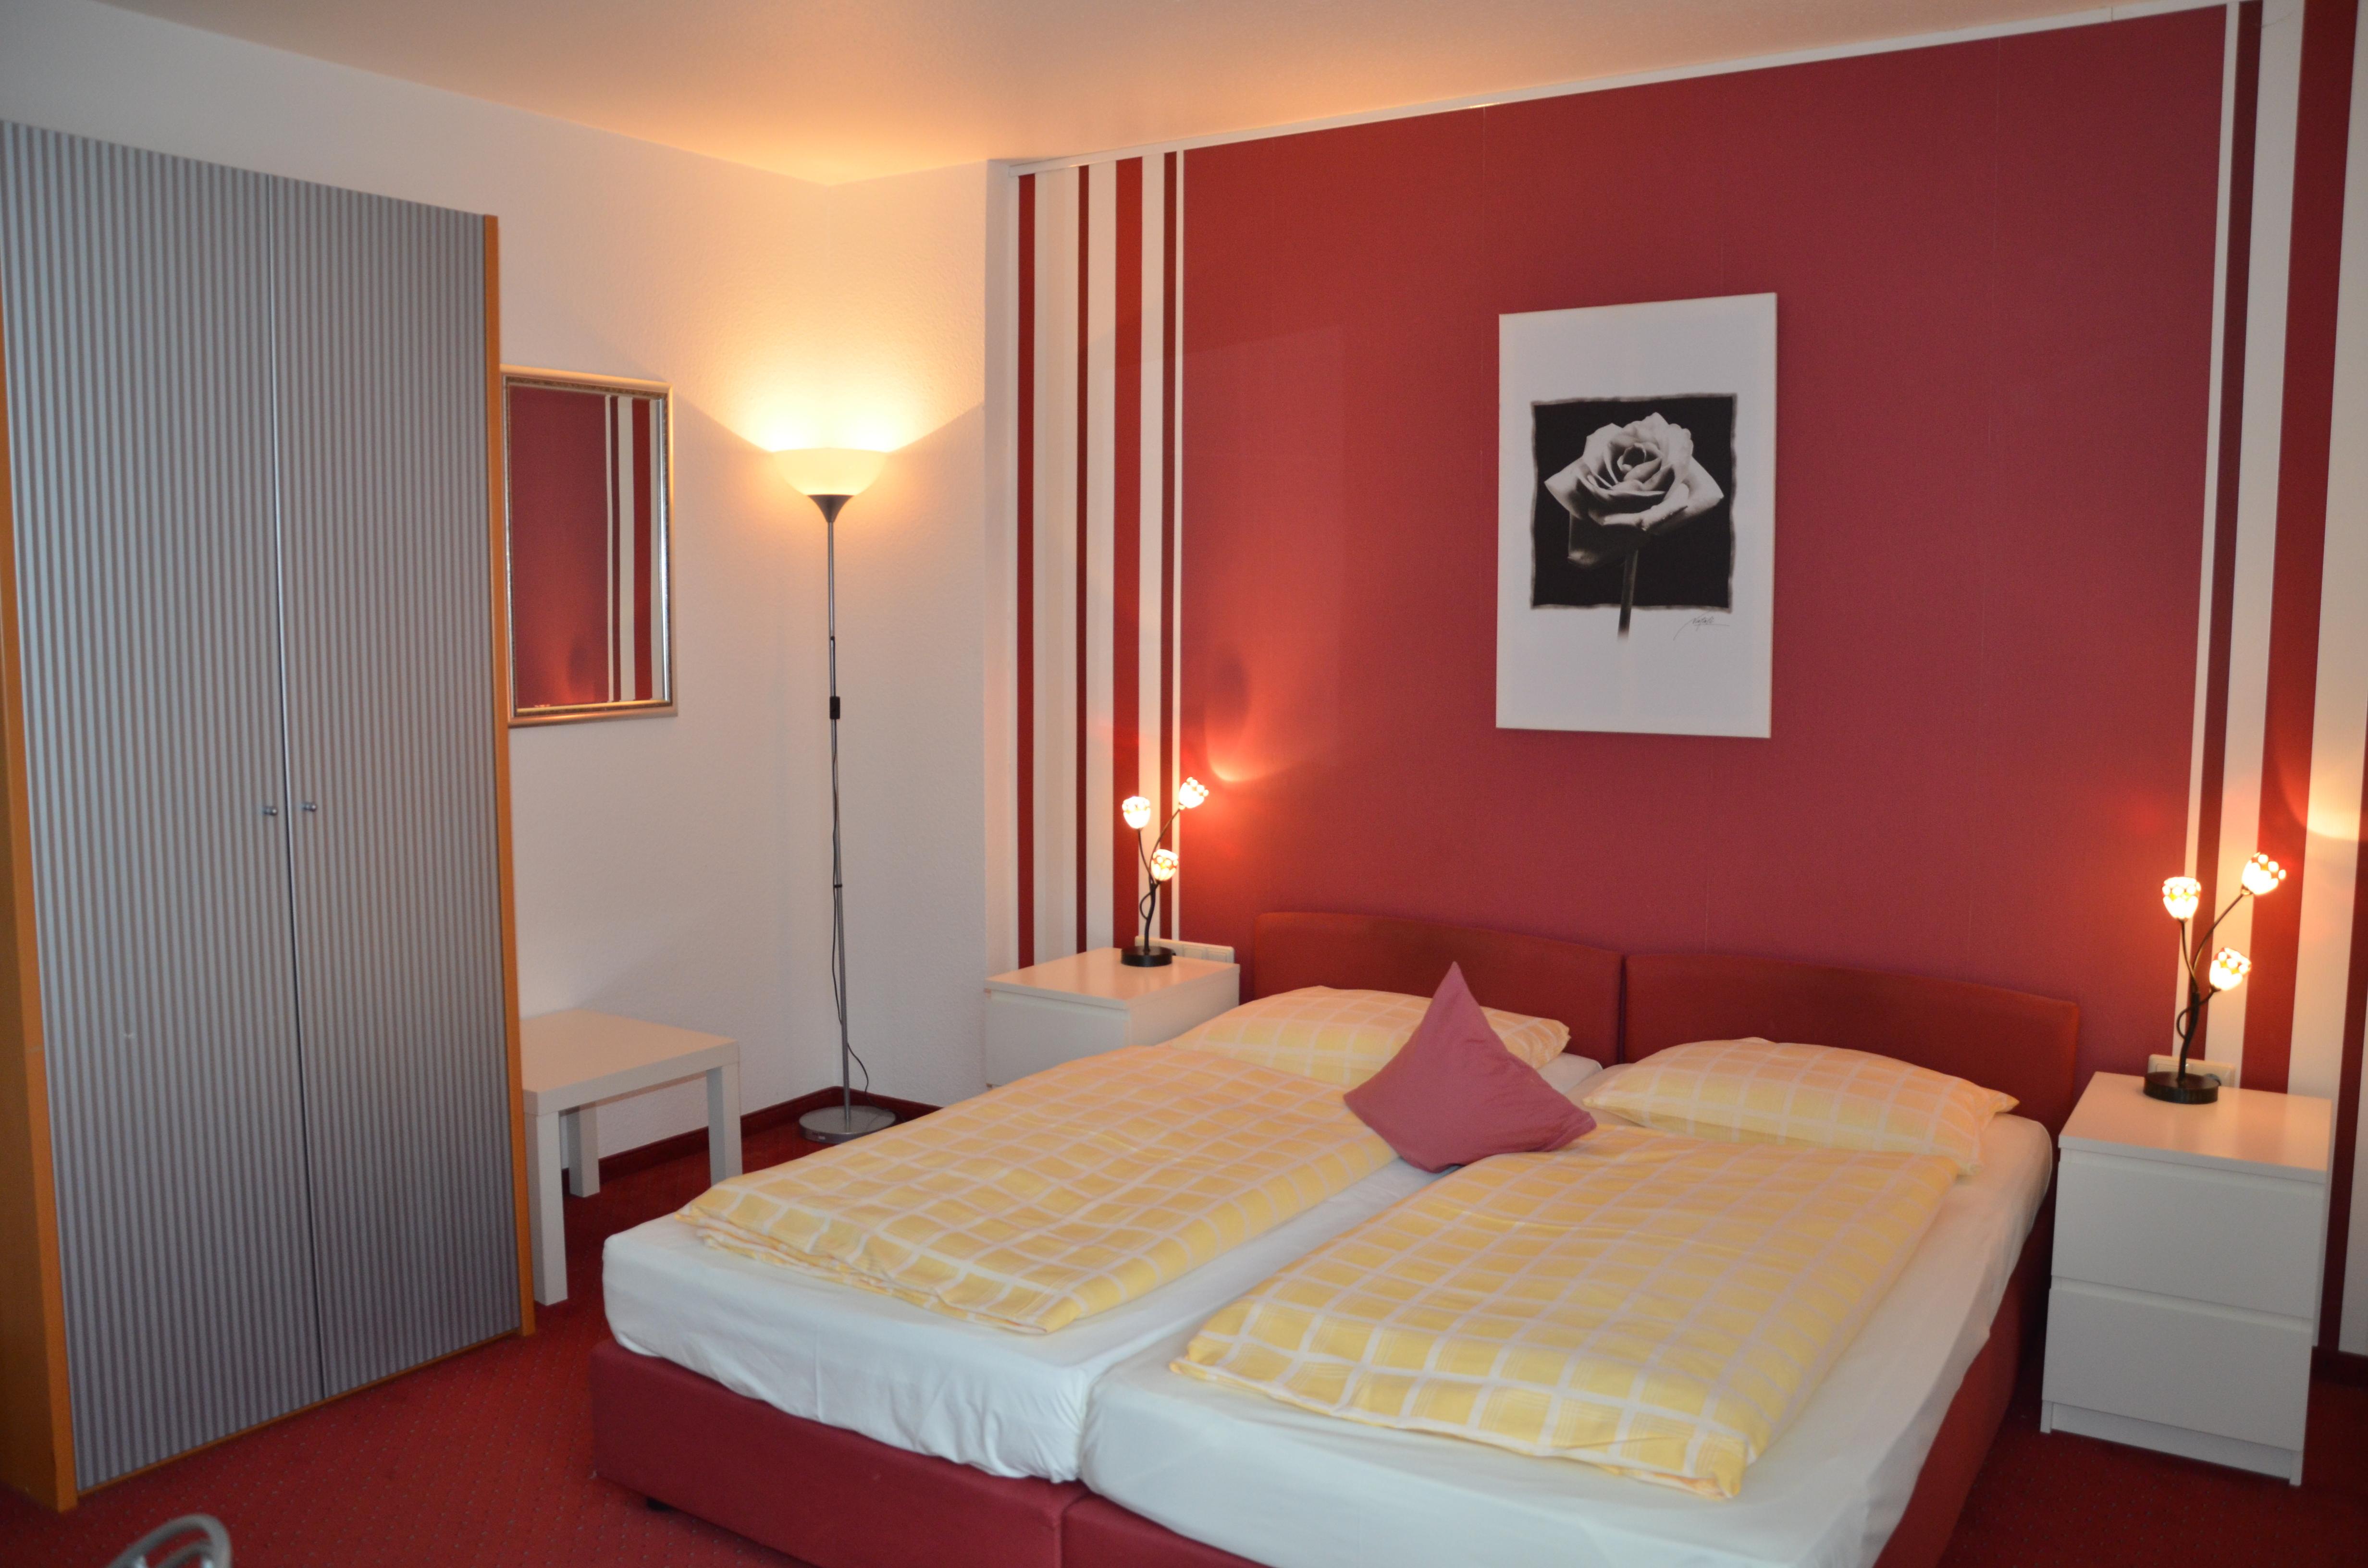 Hotels Flughafen Koln Bonn